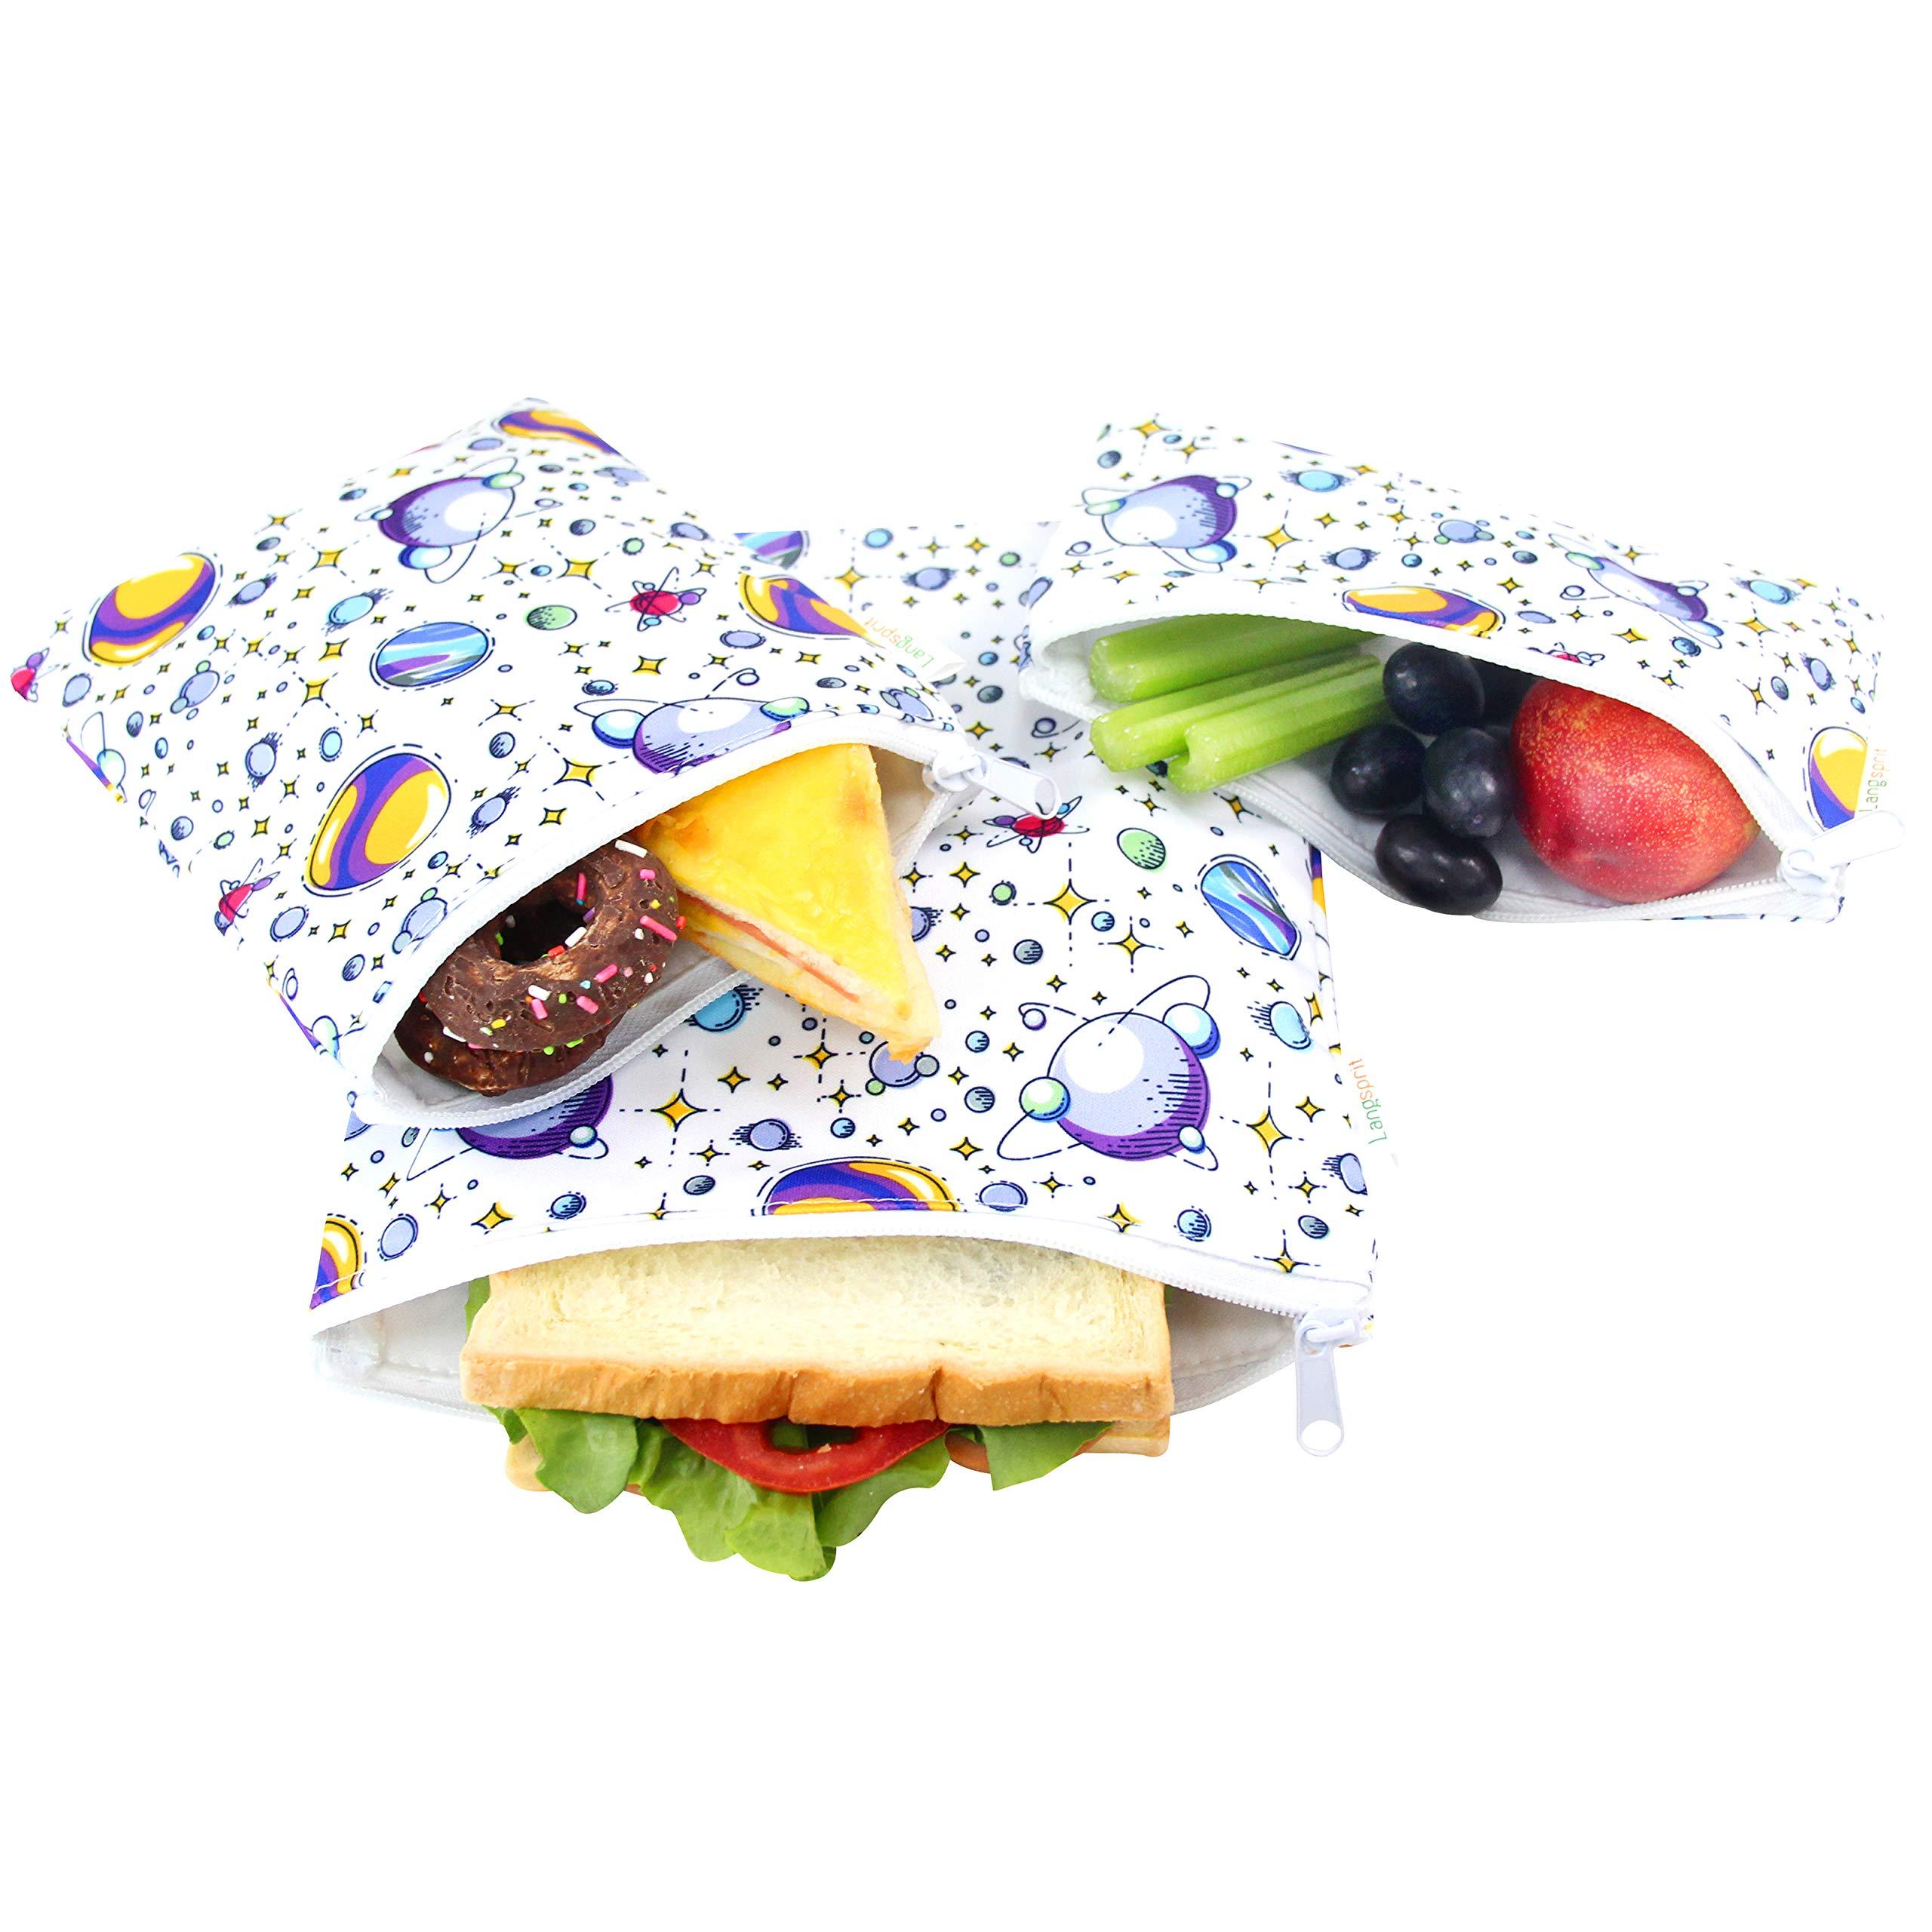 Langsprit Premium Reusable Sandwich & Snack Bags- Eco Friendly Dishwasher Safe Lunch Bags - Set of 3 - (Planet) by Langsprit